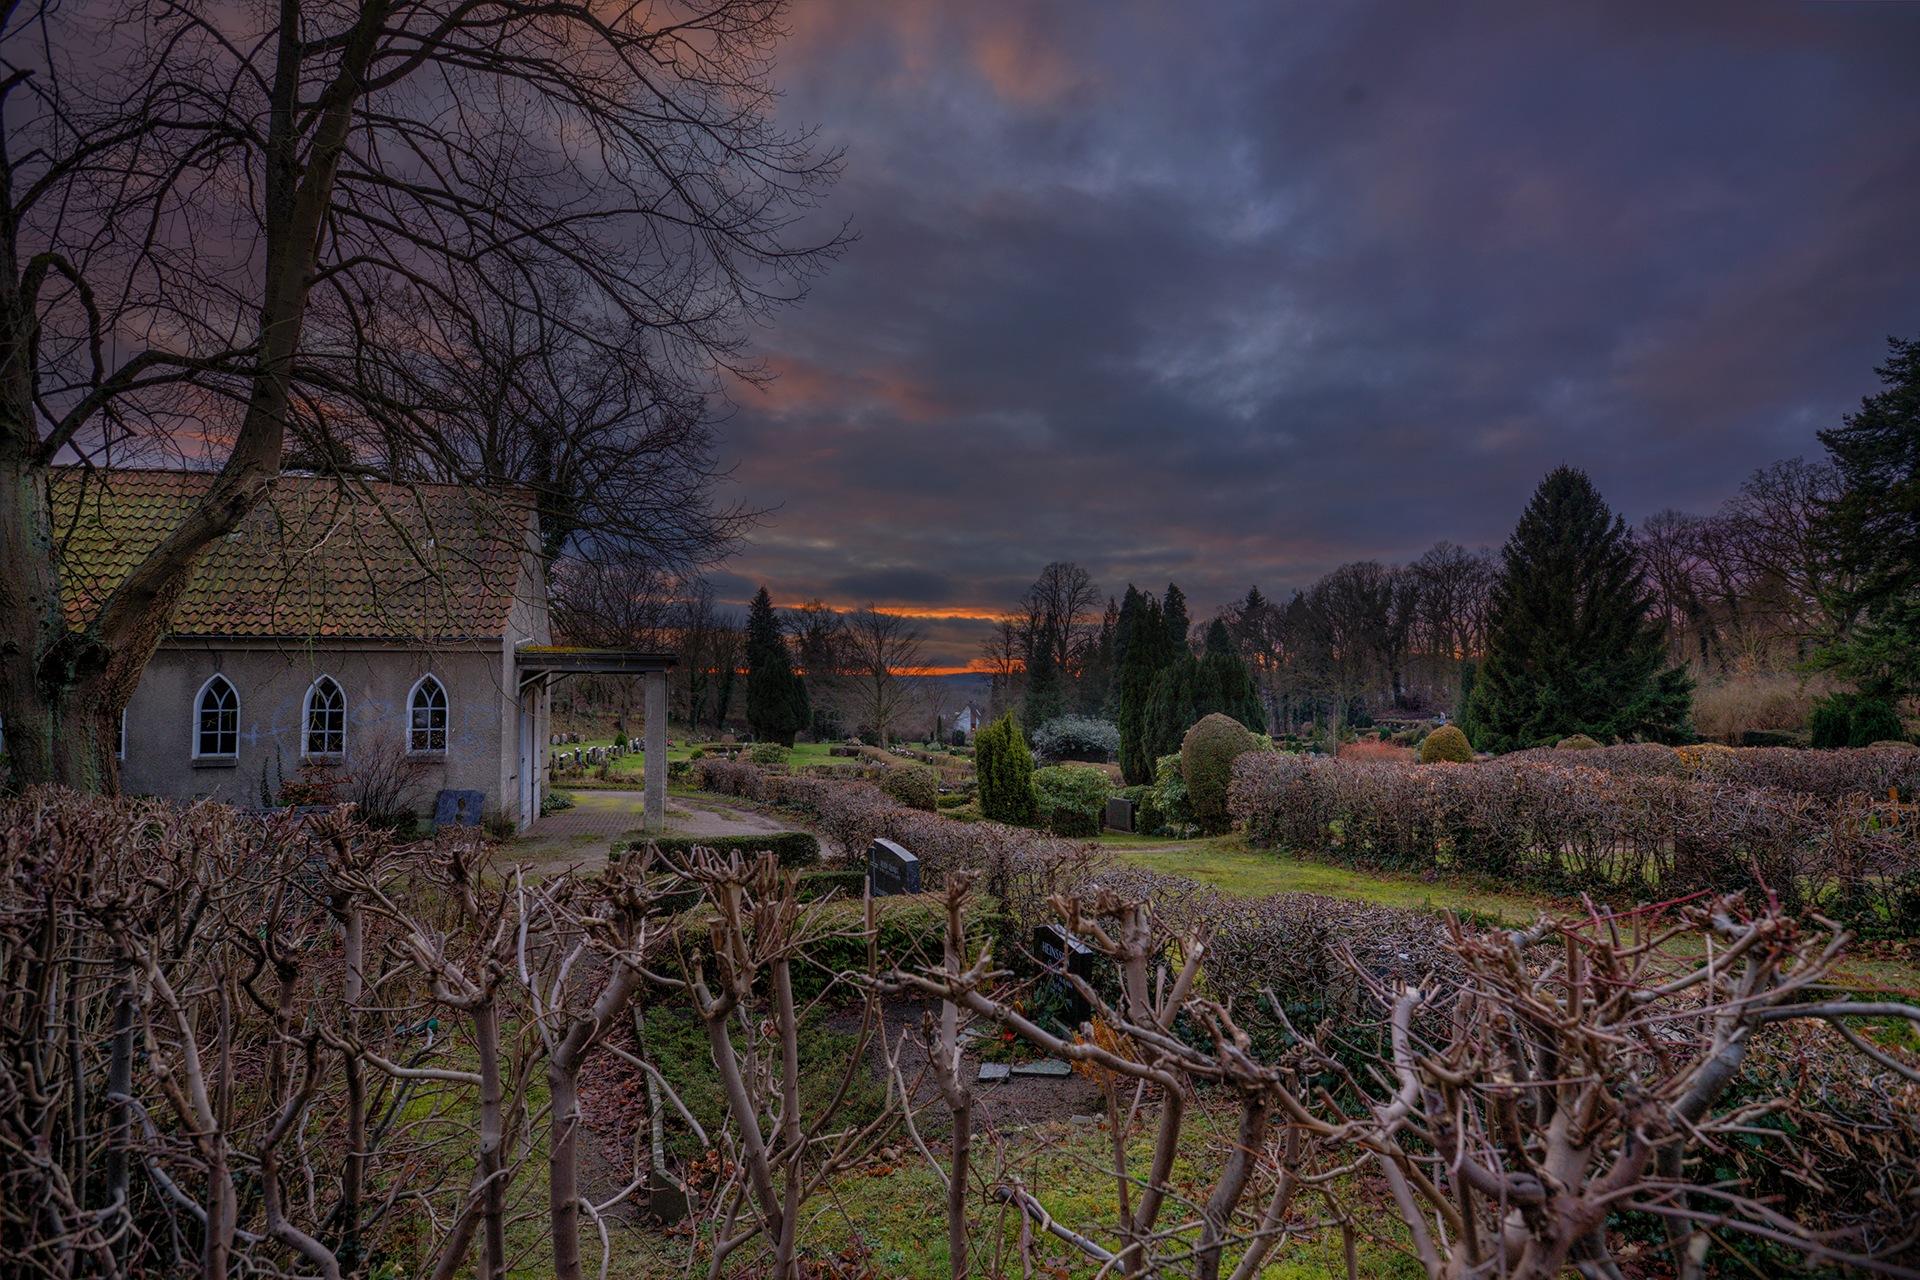 Sunset over the graveyard by Antje Oldefest Miyukikun